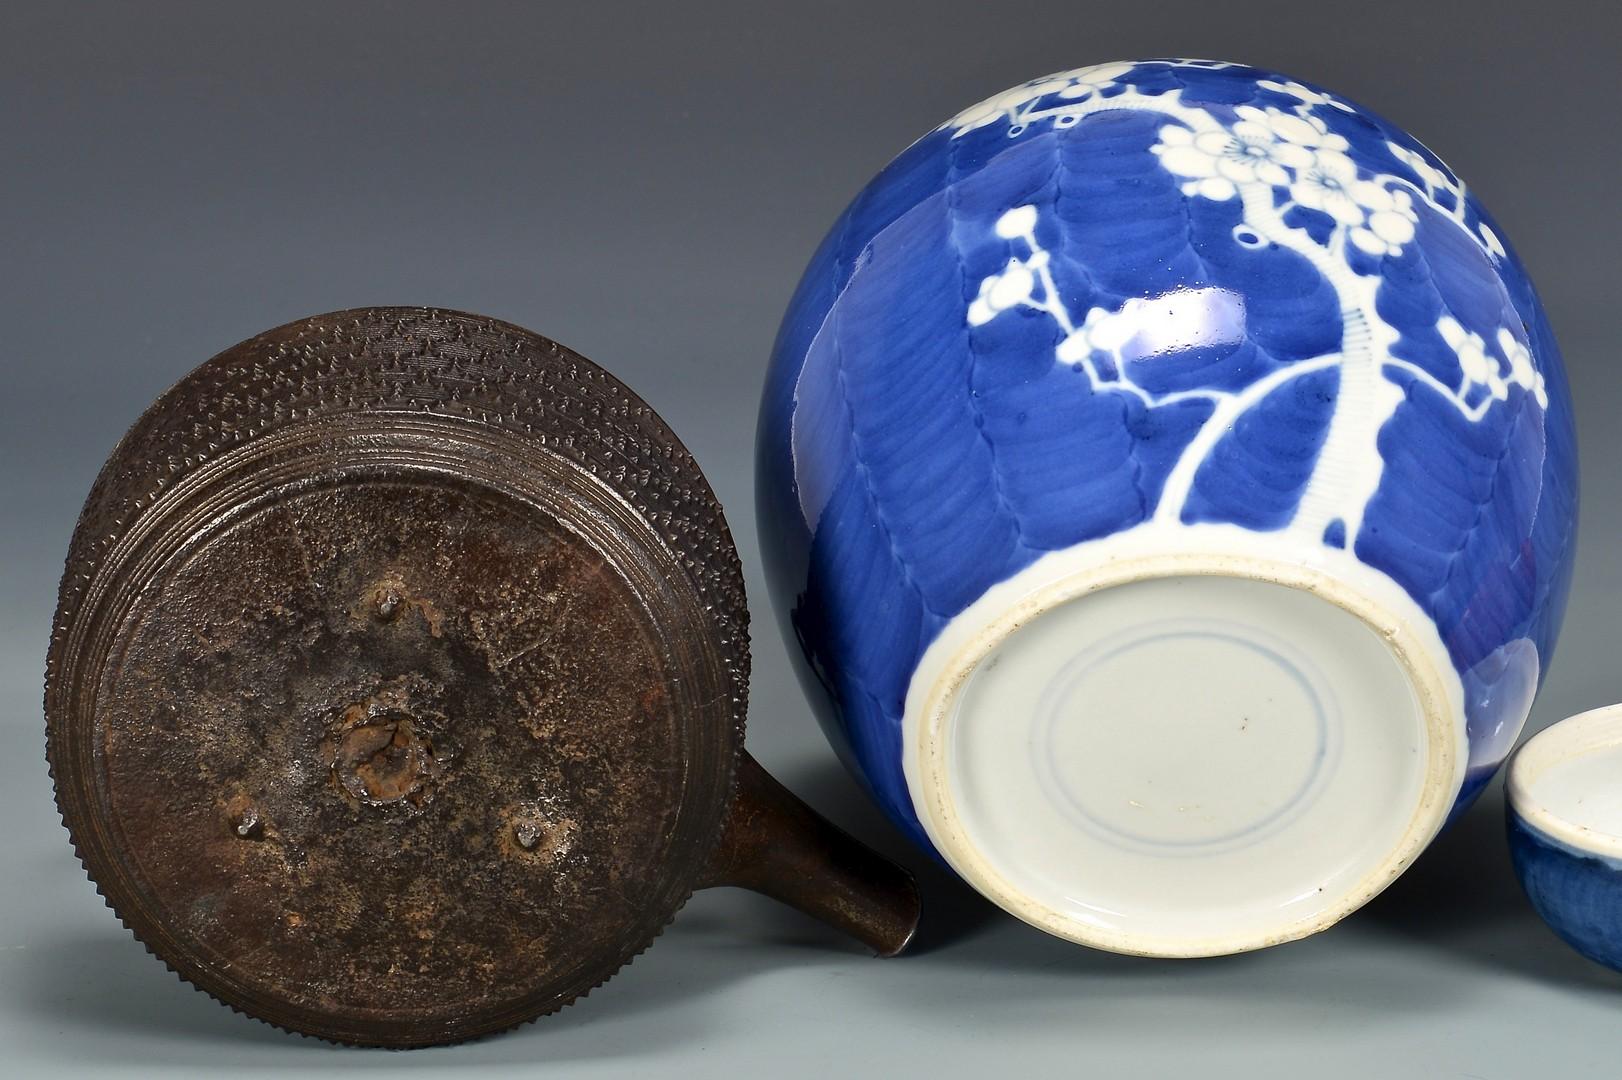 Lot 4010188: Assorted Asian items inc. petrified wood